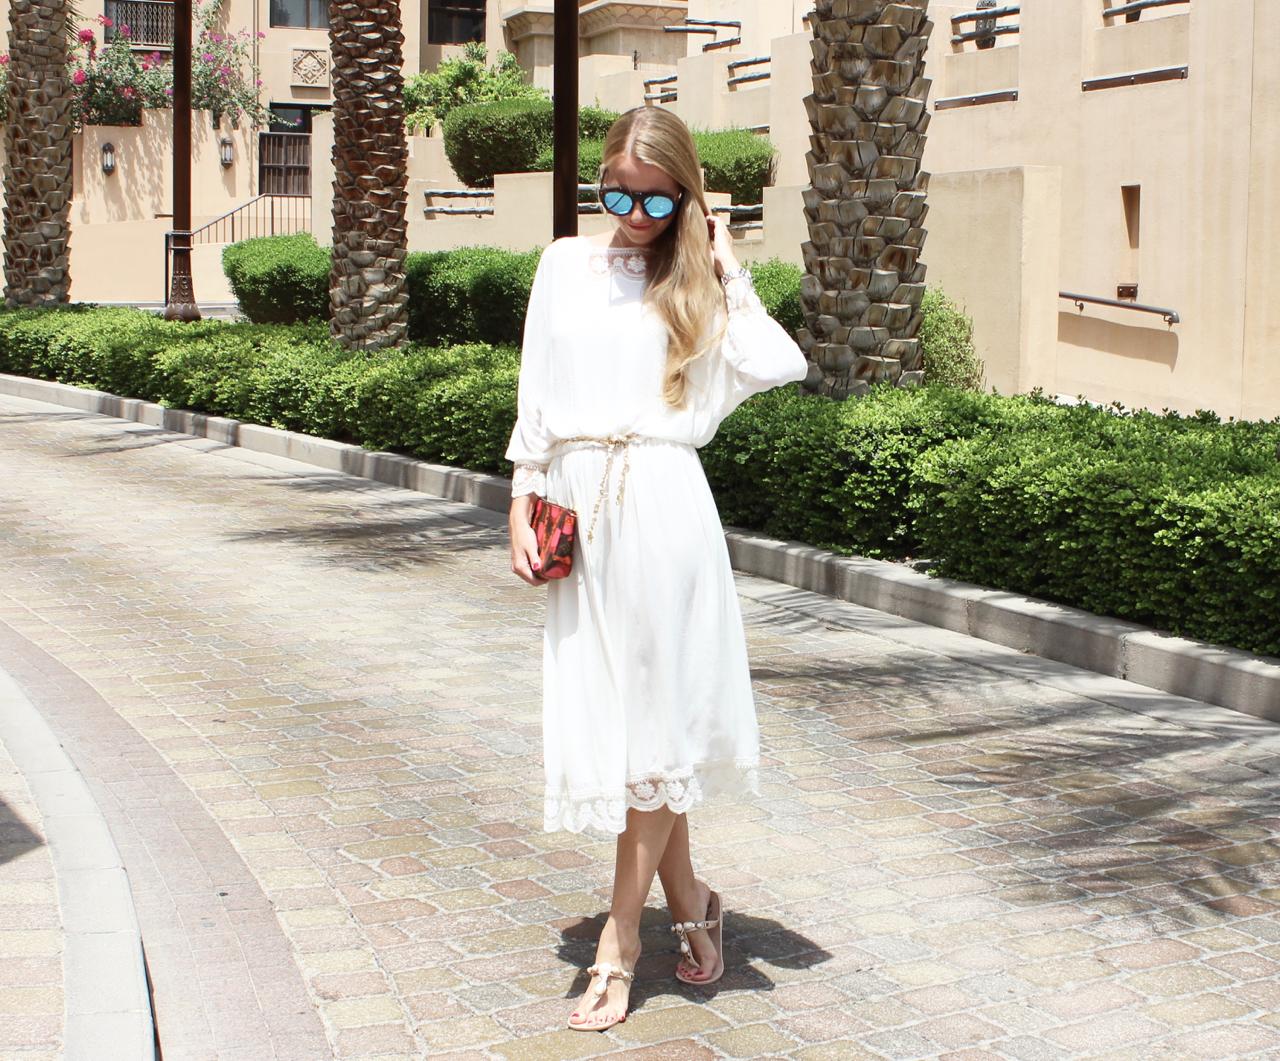 Throwback Outfit Downtown Dubai Jennifer PepperAndGold UAE VAE Emirates Fashion Zara BestSecret LV LouisVuitton